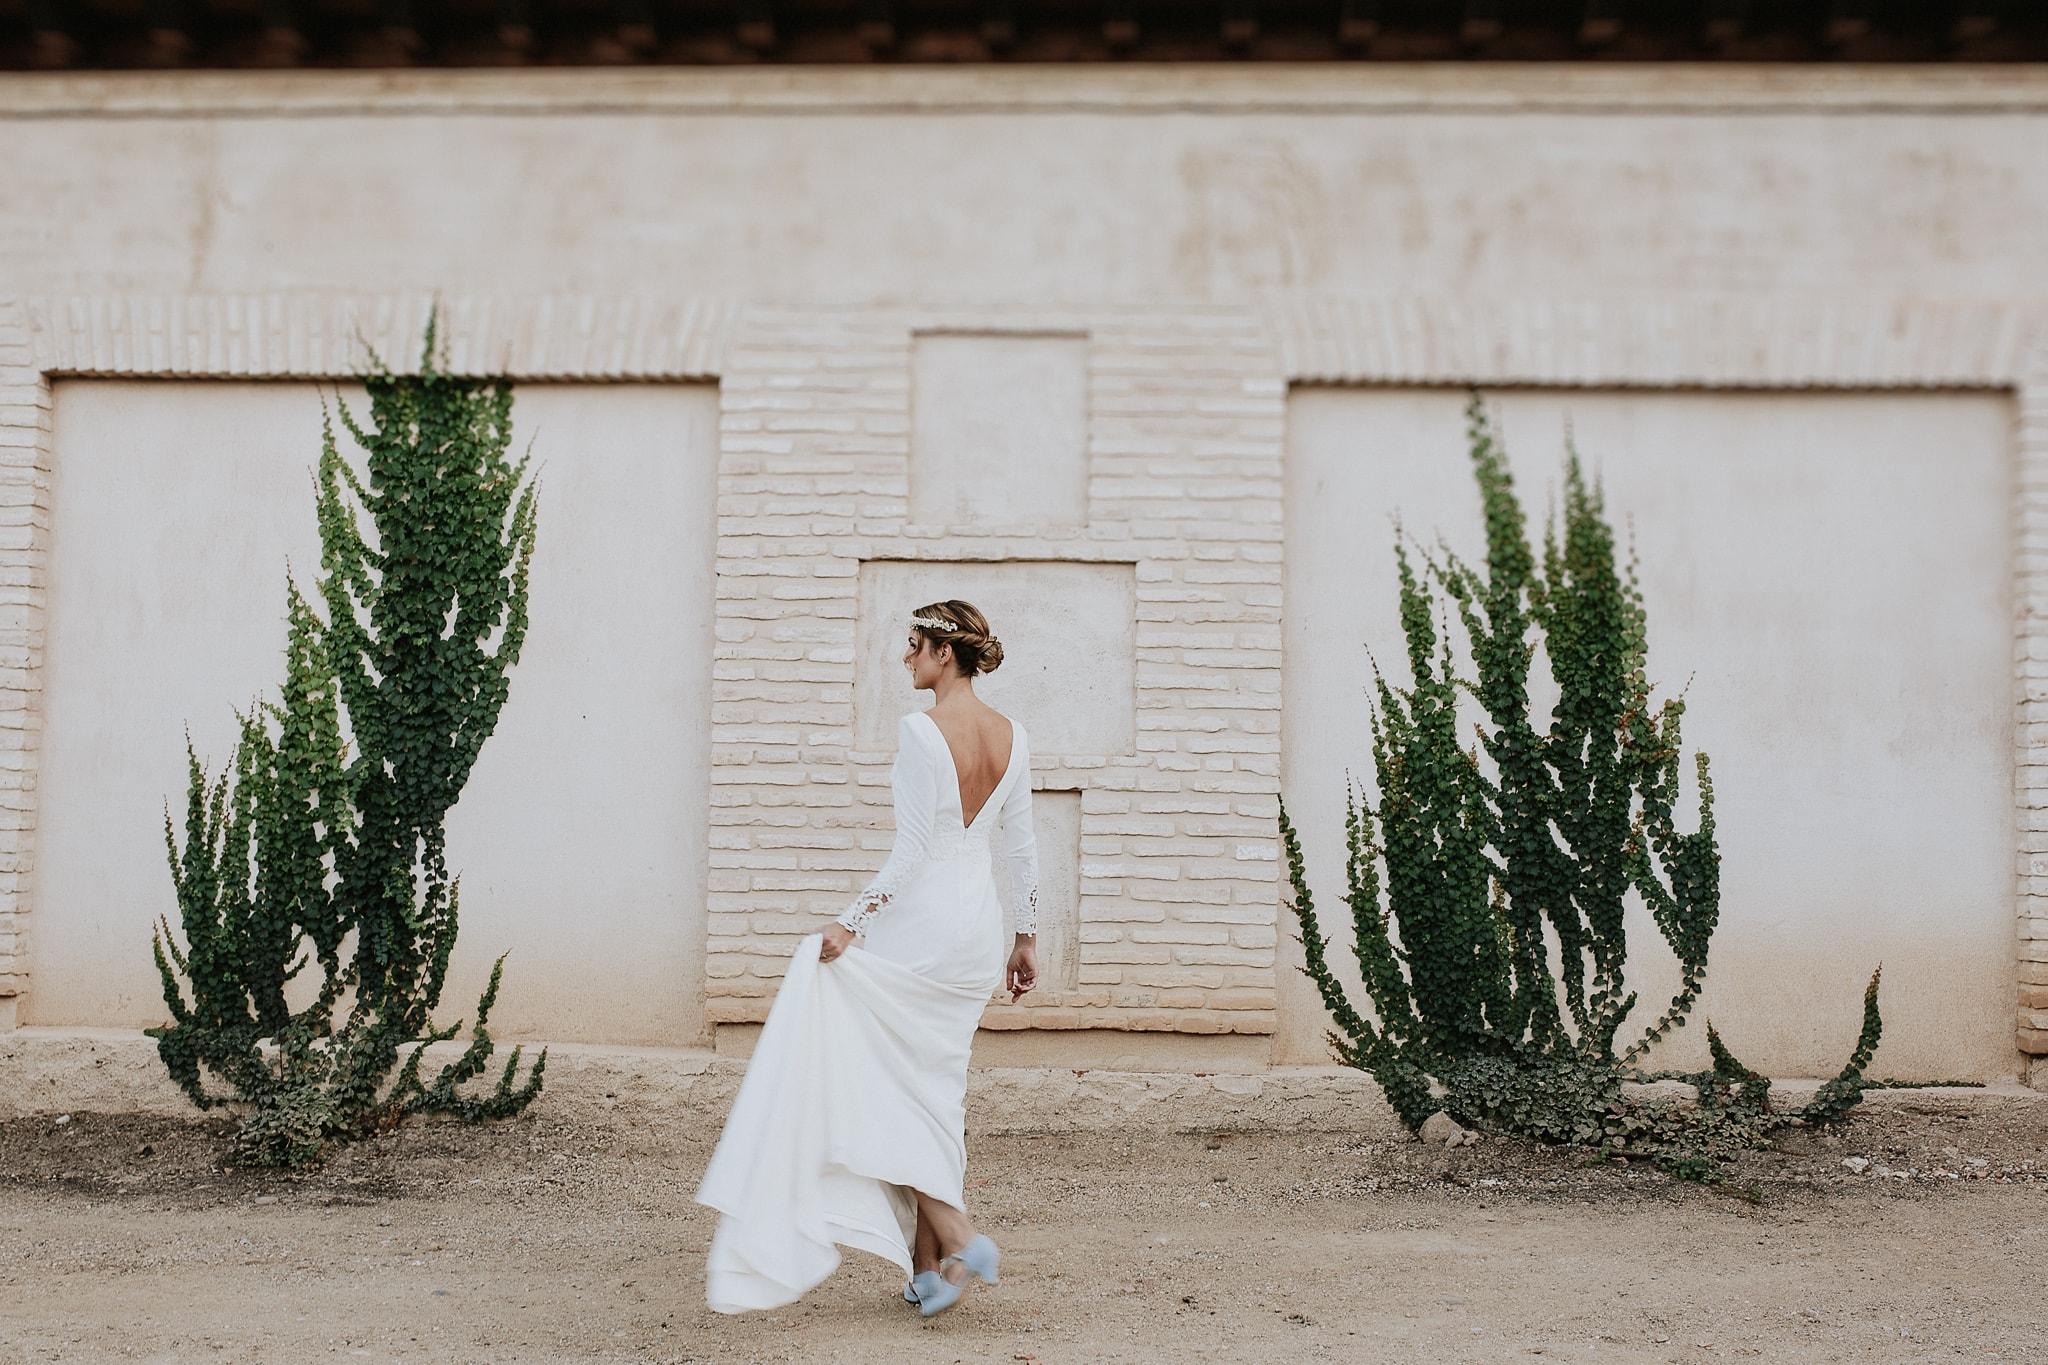 prisma-blanco-fotografos-bodas-toledo-96